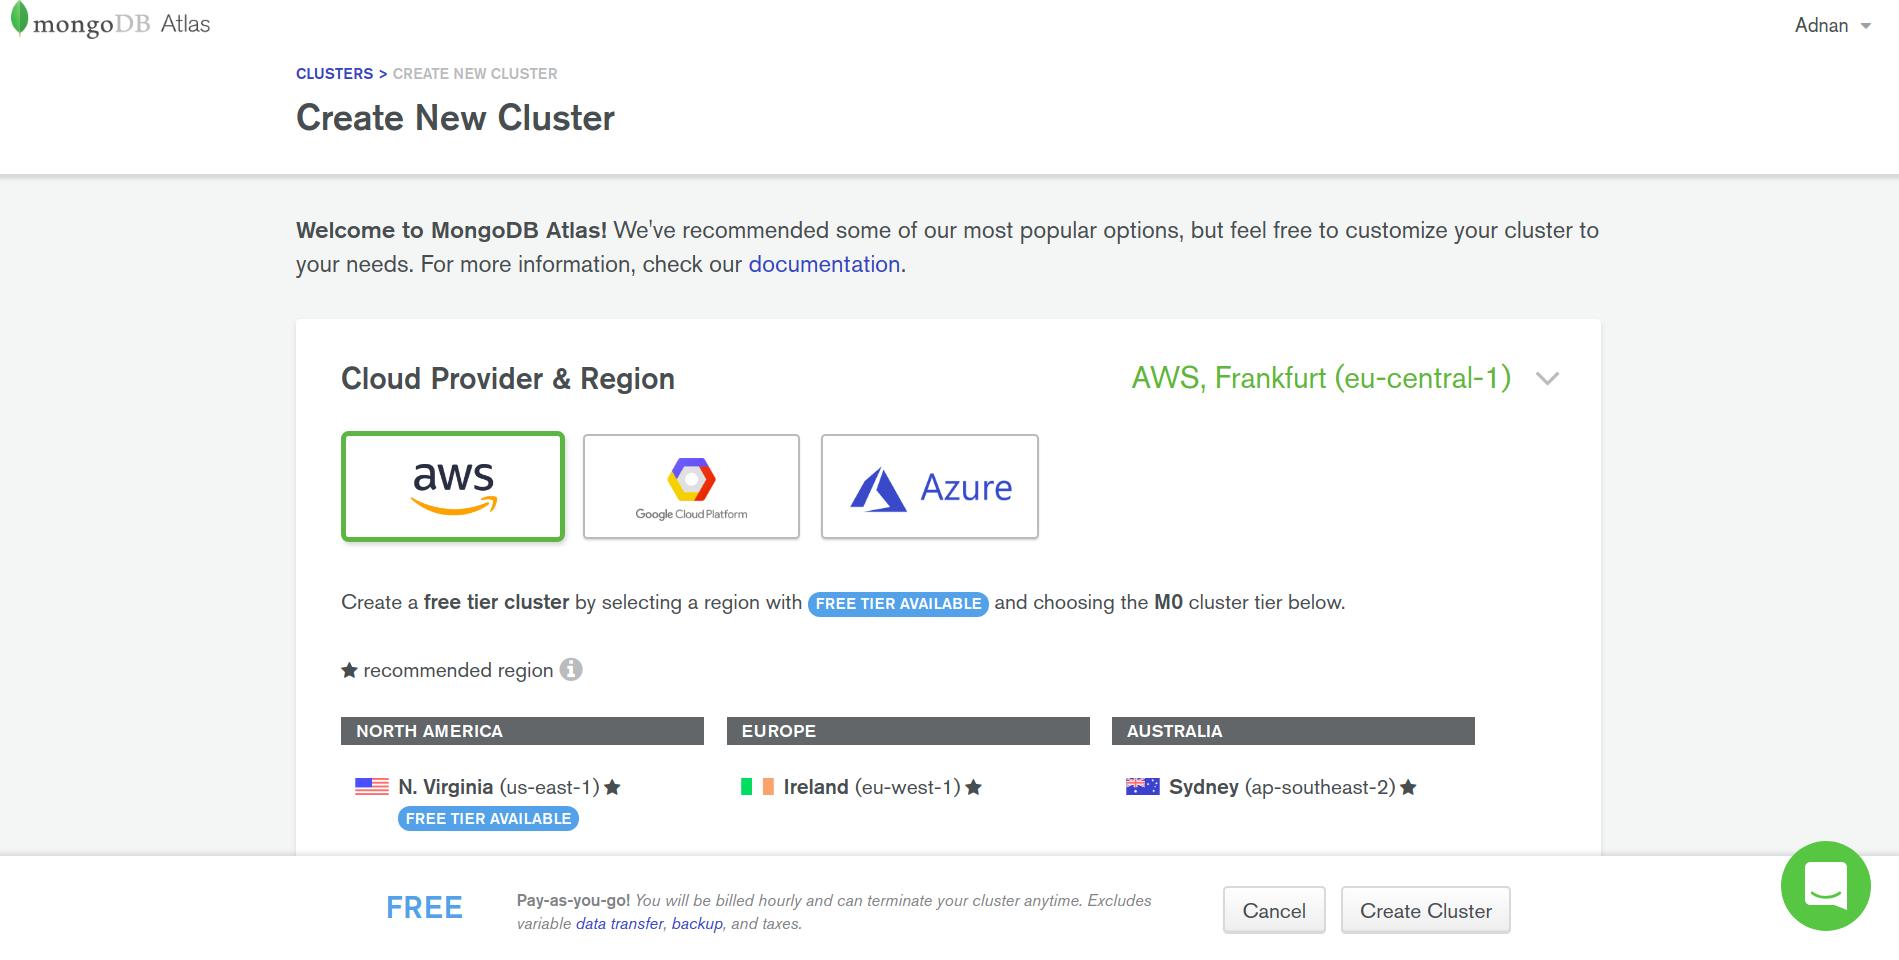 A Crash Course on Serverless APIs with Express and MongoDB - DZone Cloud